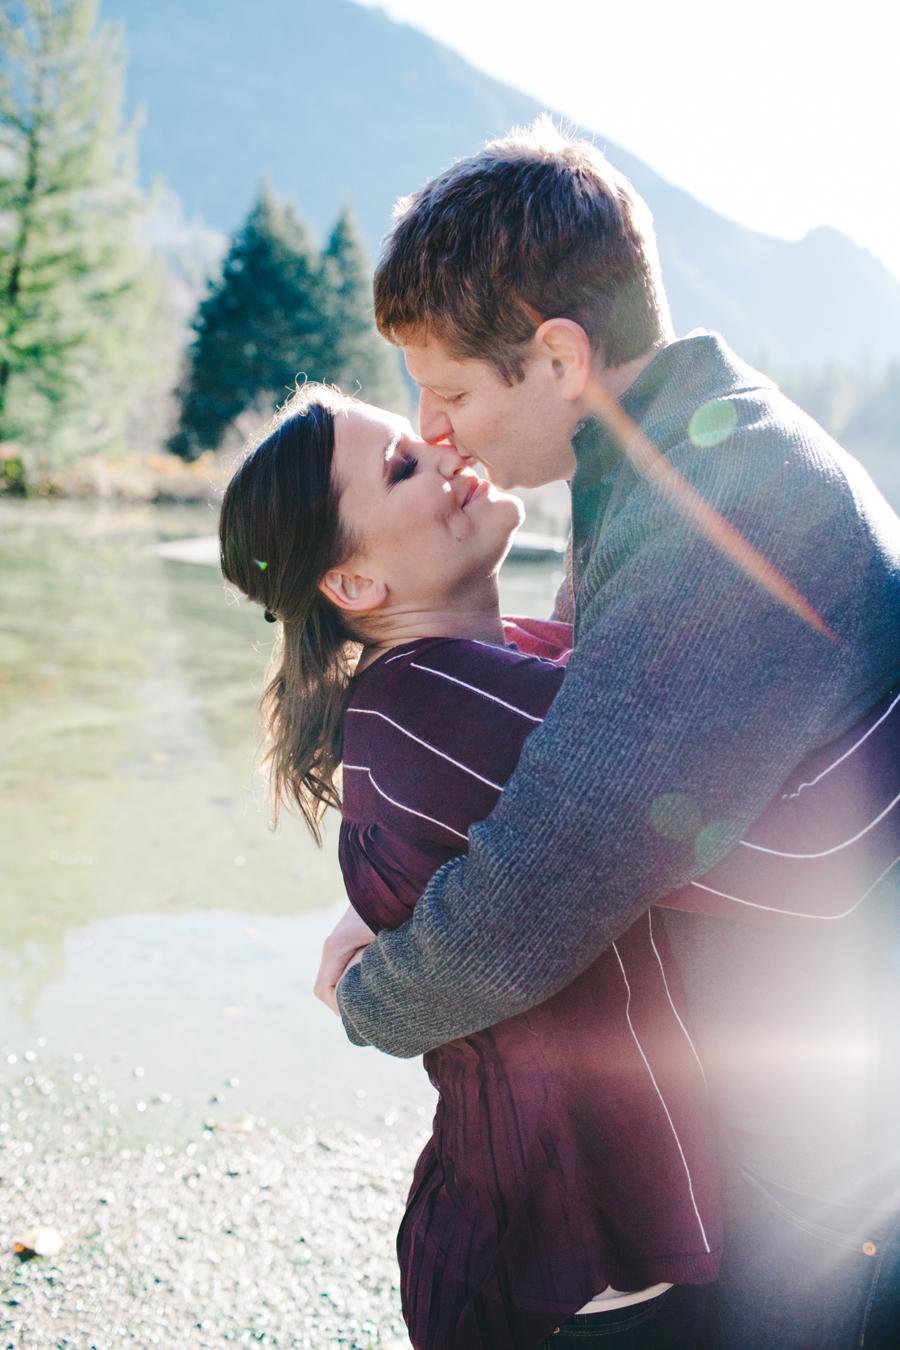 034-silver-lake-engagement-session-bellingham-engagement-photographer-katheryn-moran-photography.jpg